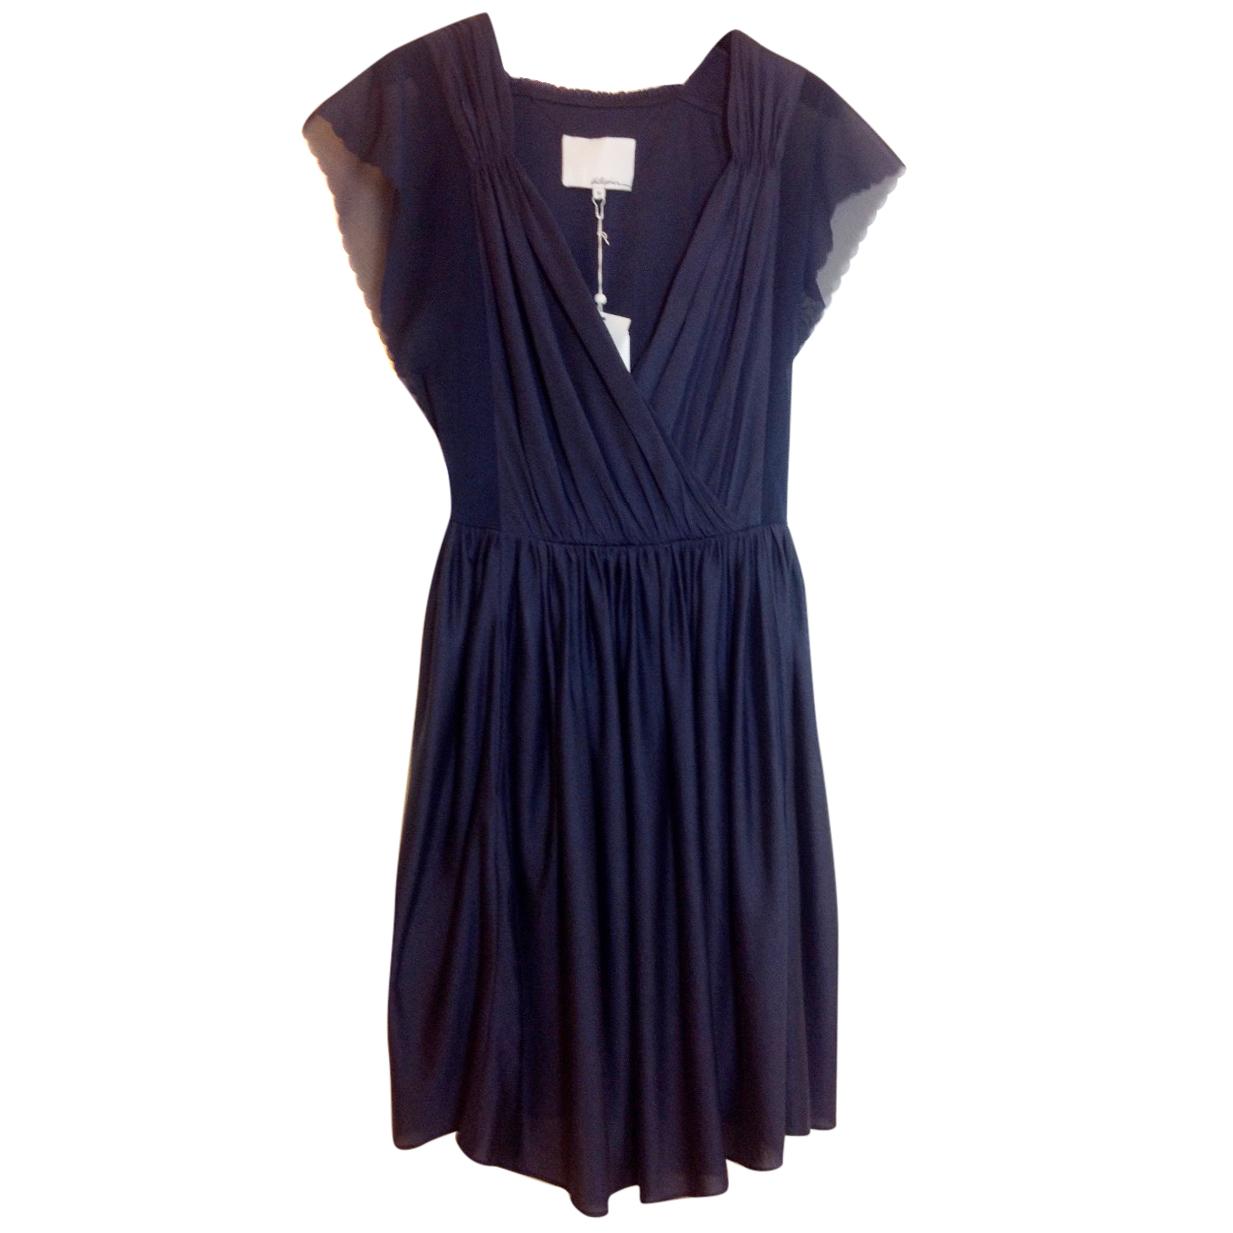 3.1 Phillip Lim Silk Jersey Dress